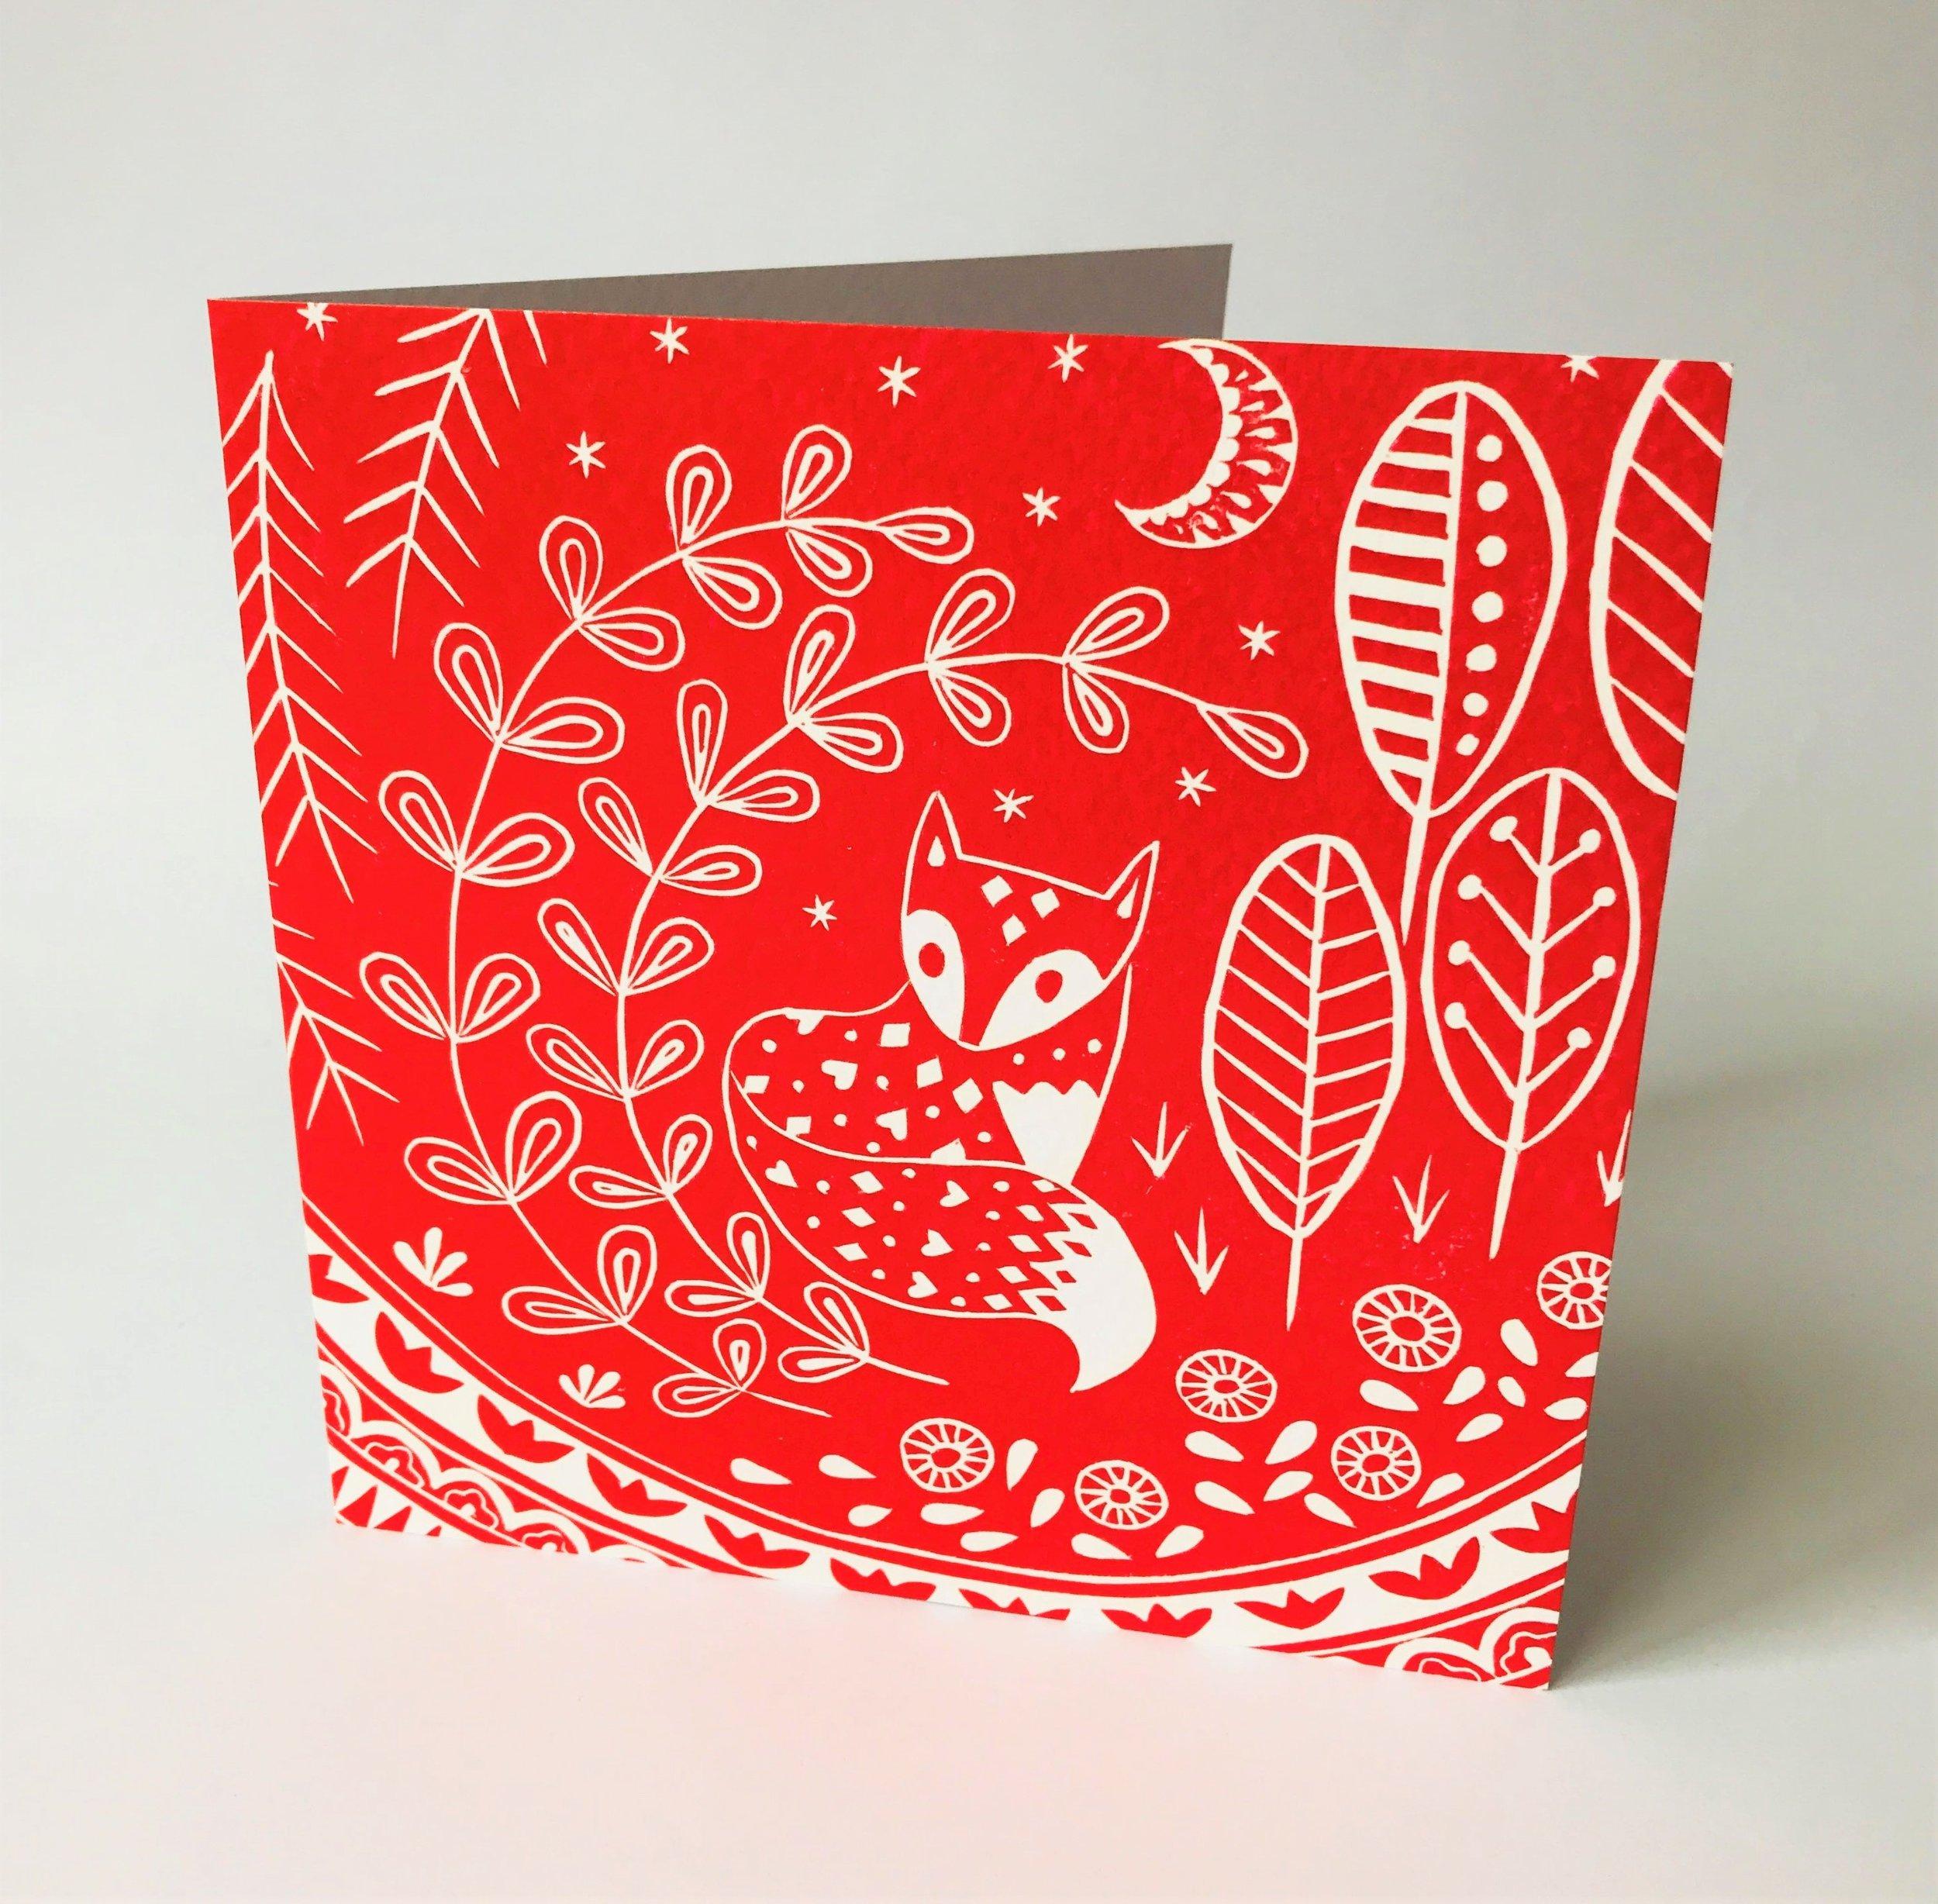 Daniel Fox in Red  Card  15 x 15 cm  £2.50